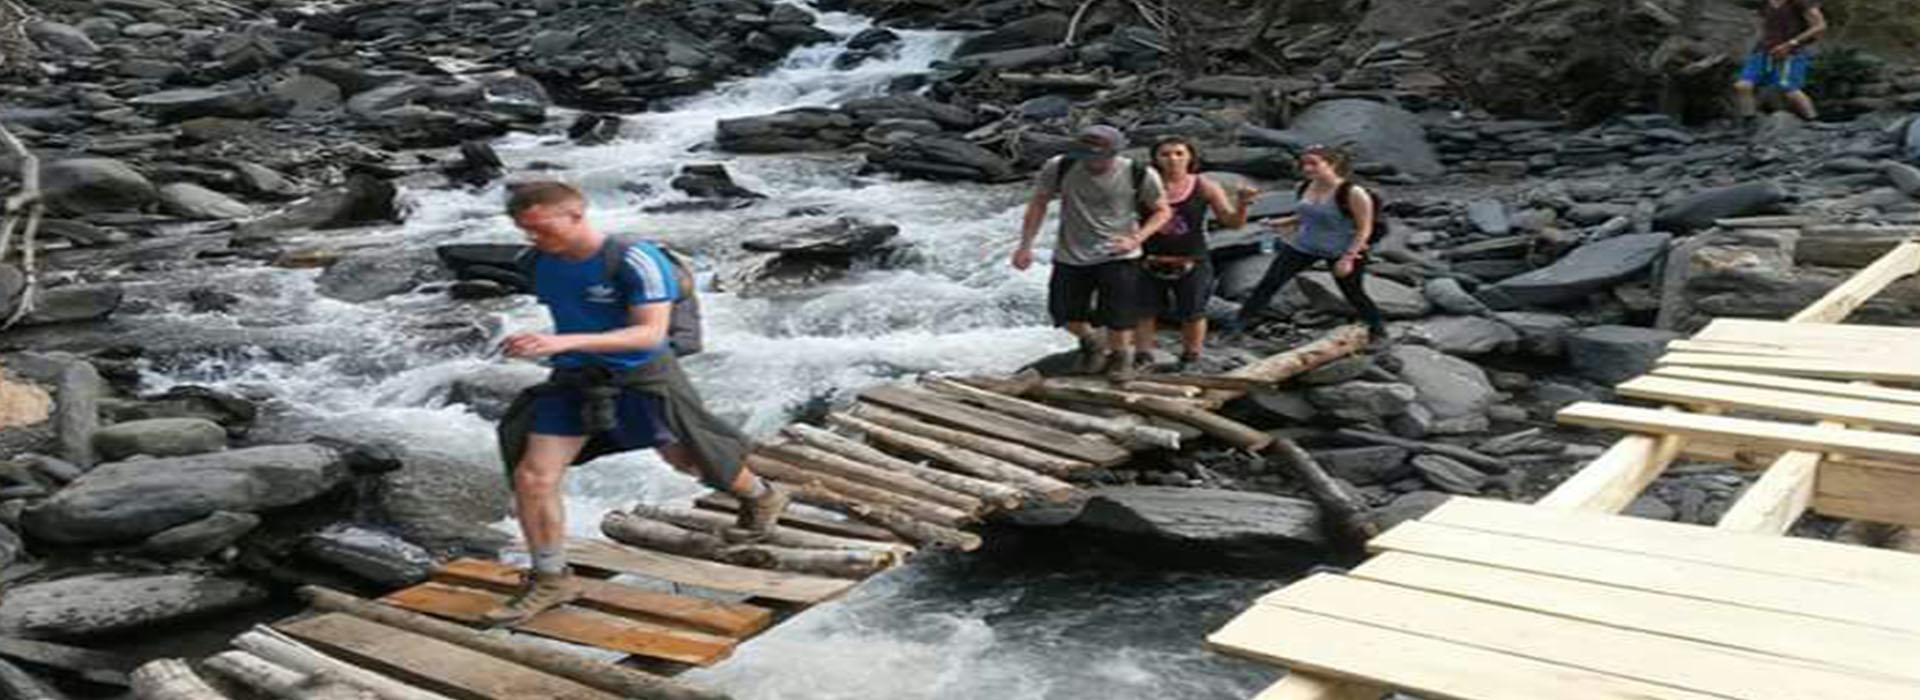 Inka Jungle Trek to Machu Picchu 4 days return by train last day